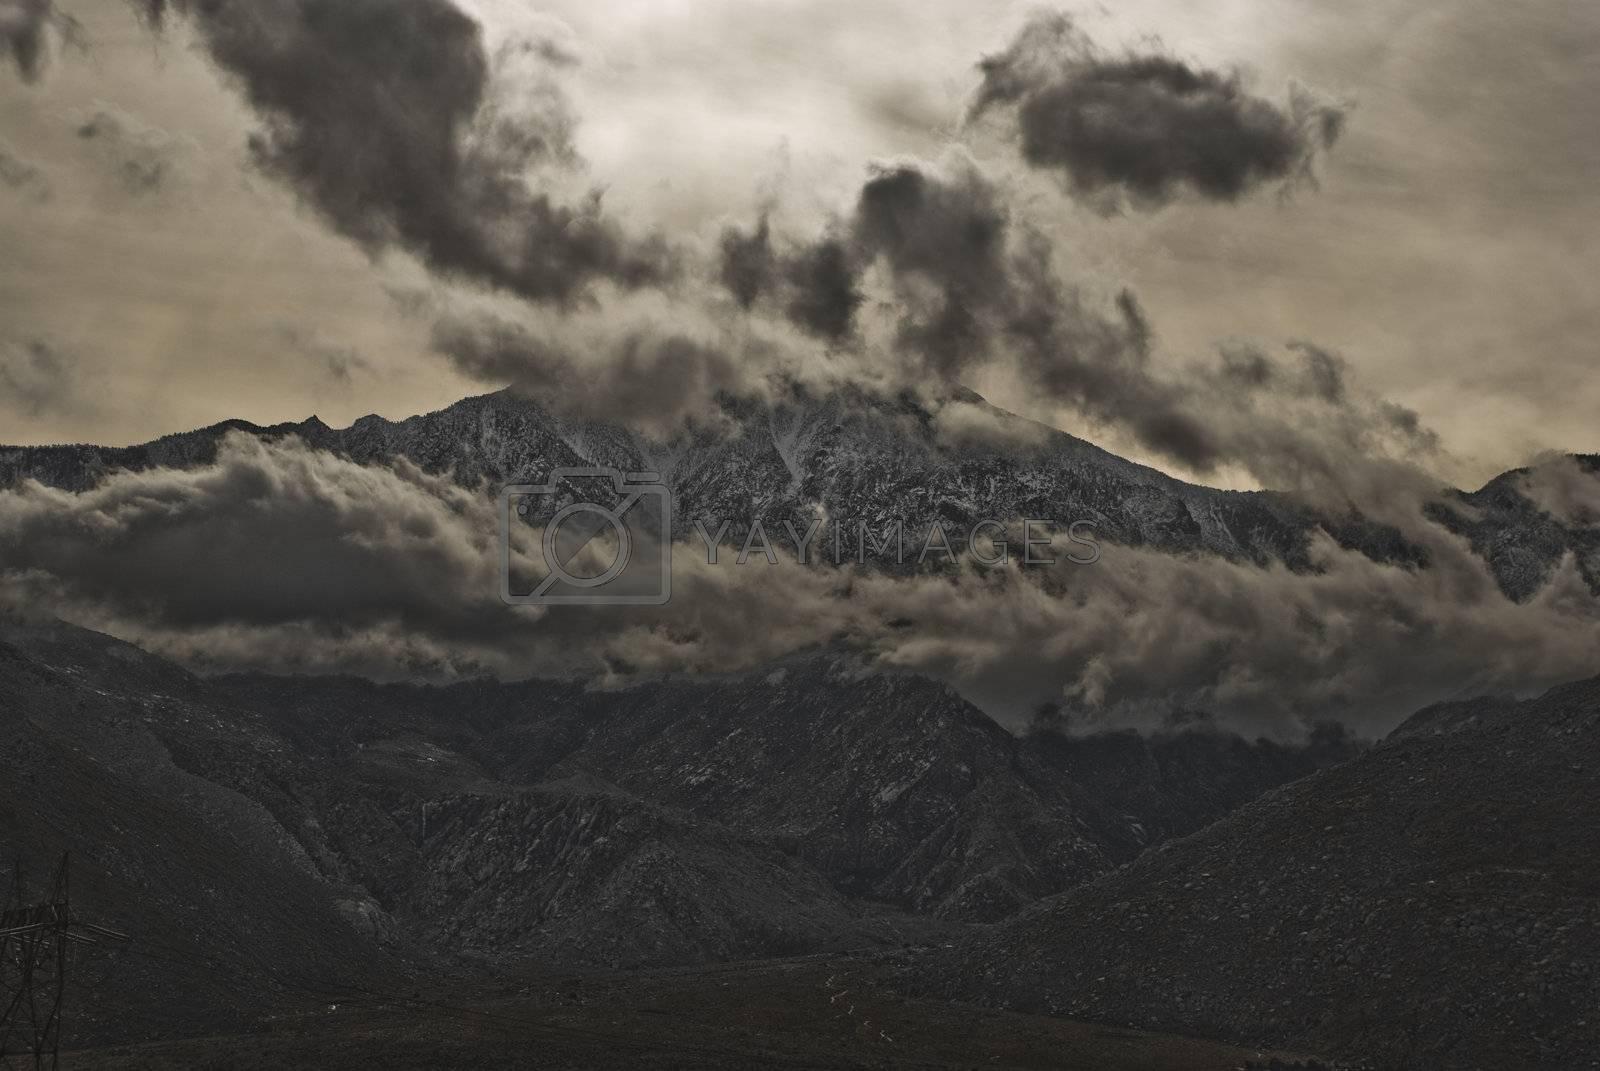 Sun shines through heavy clouds over a mountain